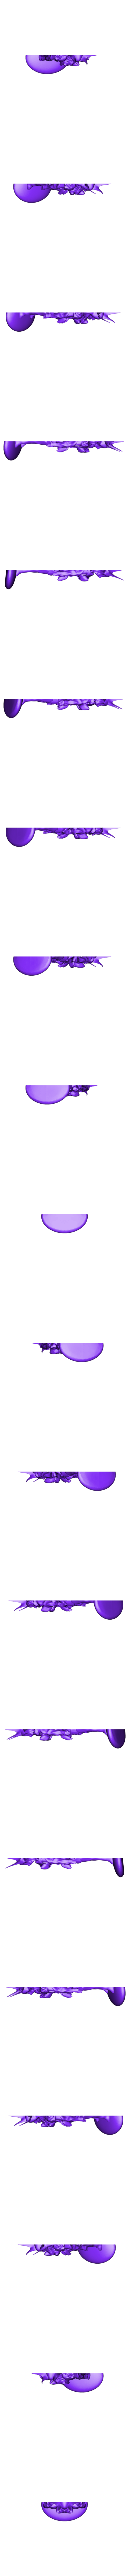 femme 1.stl Download OBJ file 10 Intergalactic Humanoids • 3D print object, Majin59